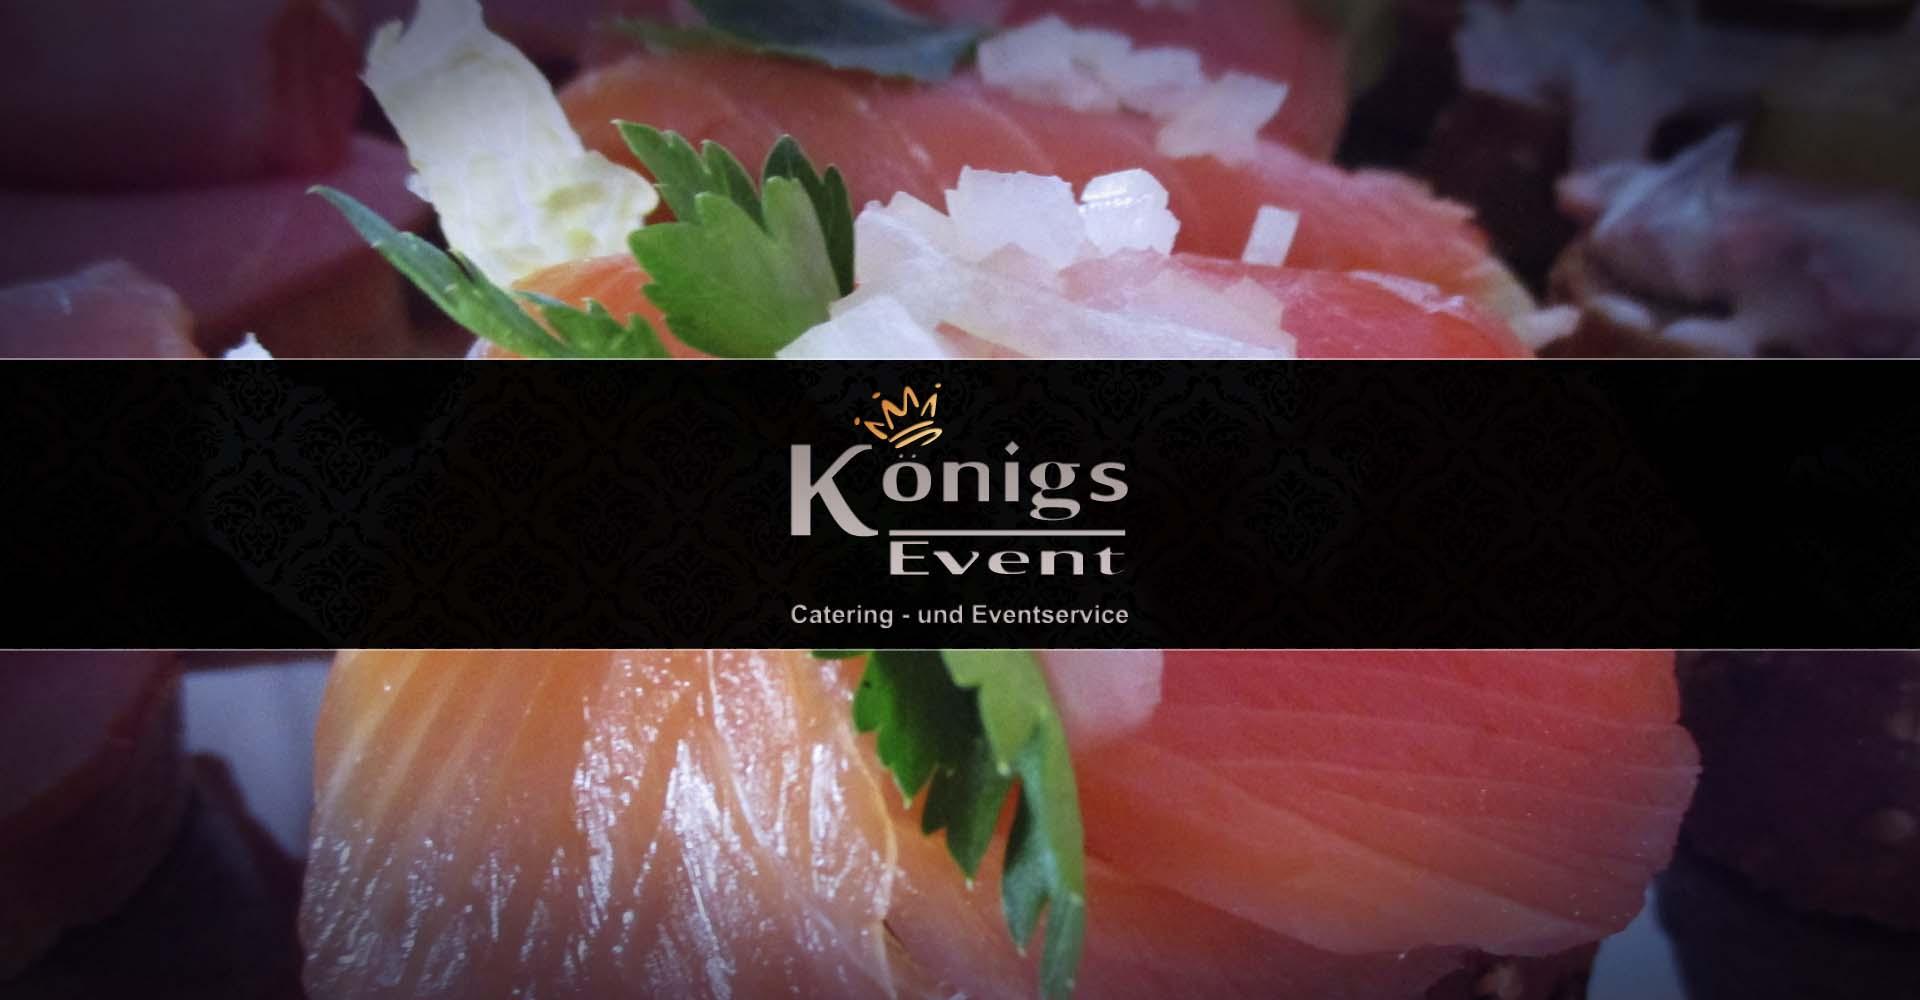 2015-05-26-Startbild-Koenigs-event-082